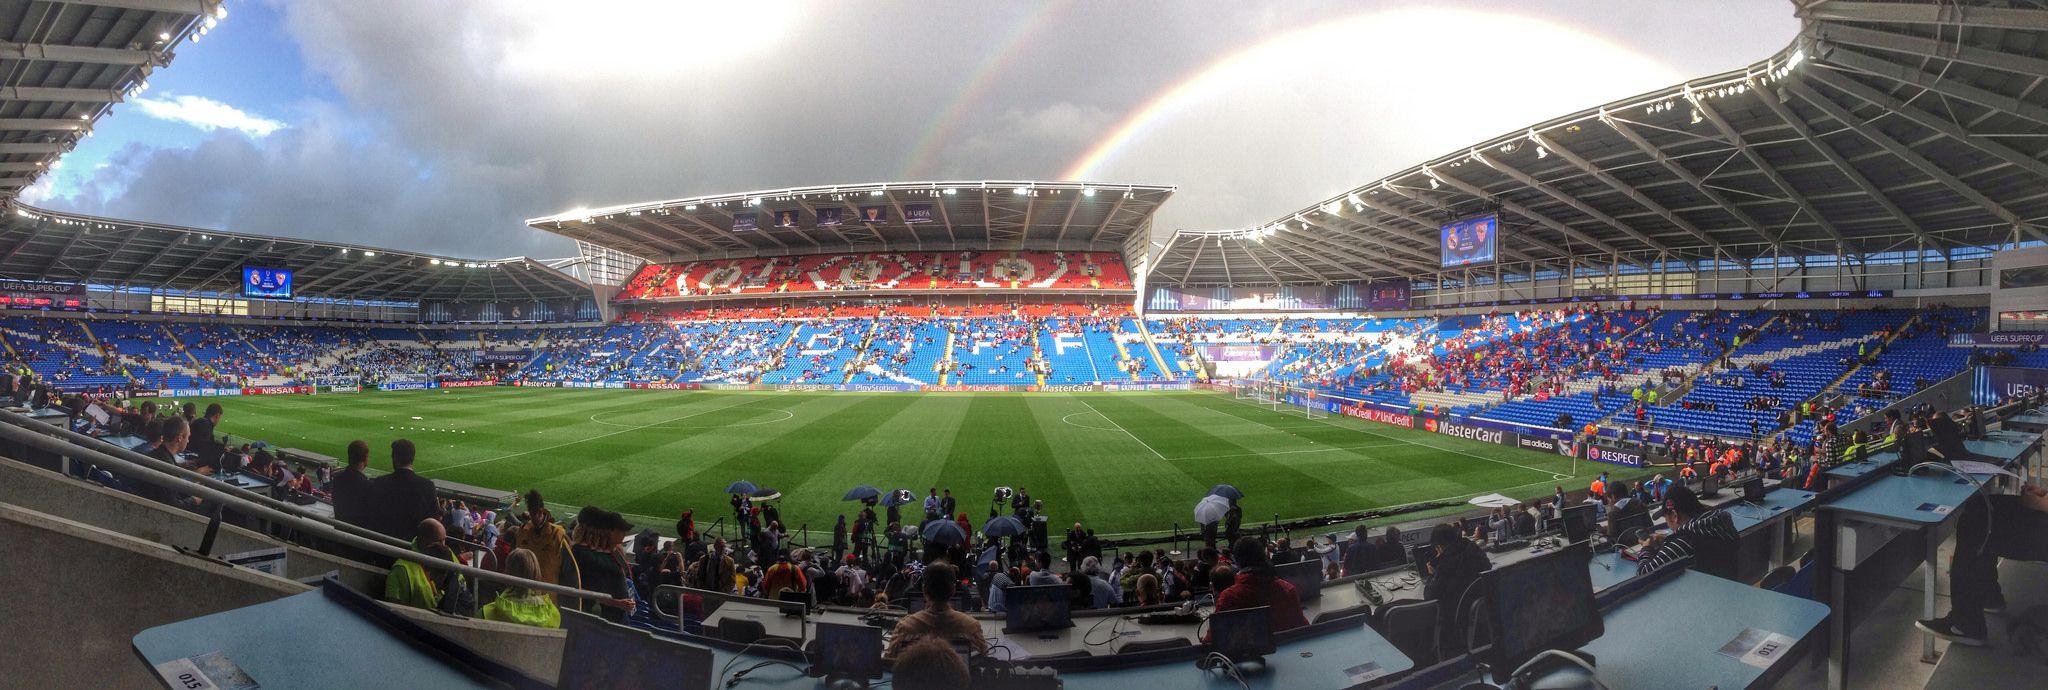 cardiff_city_stadium21